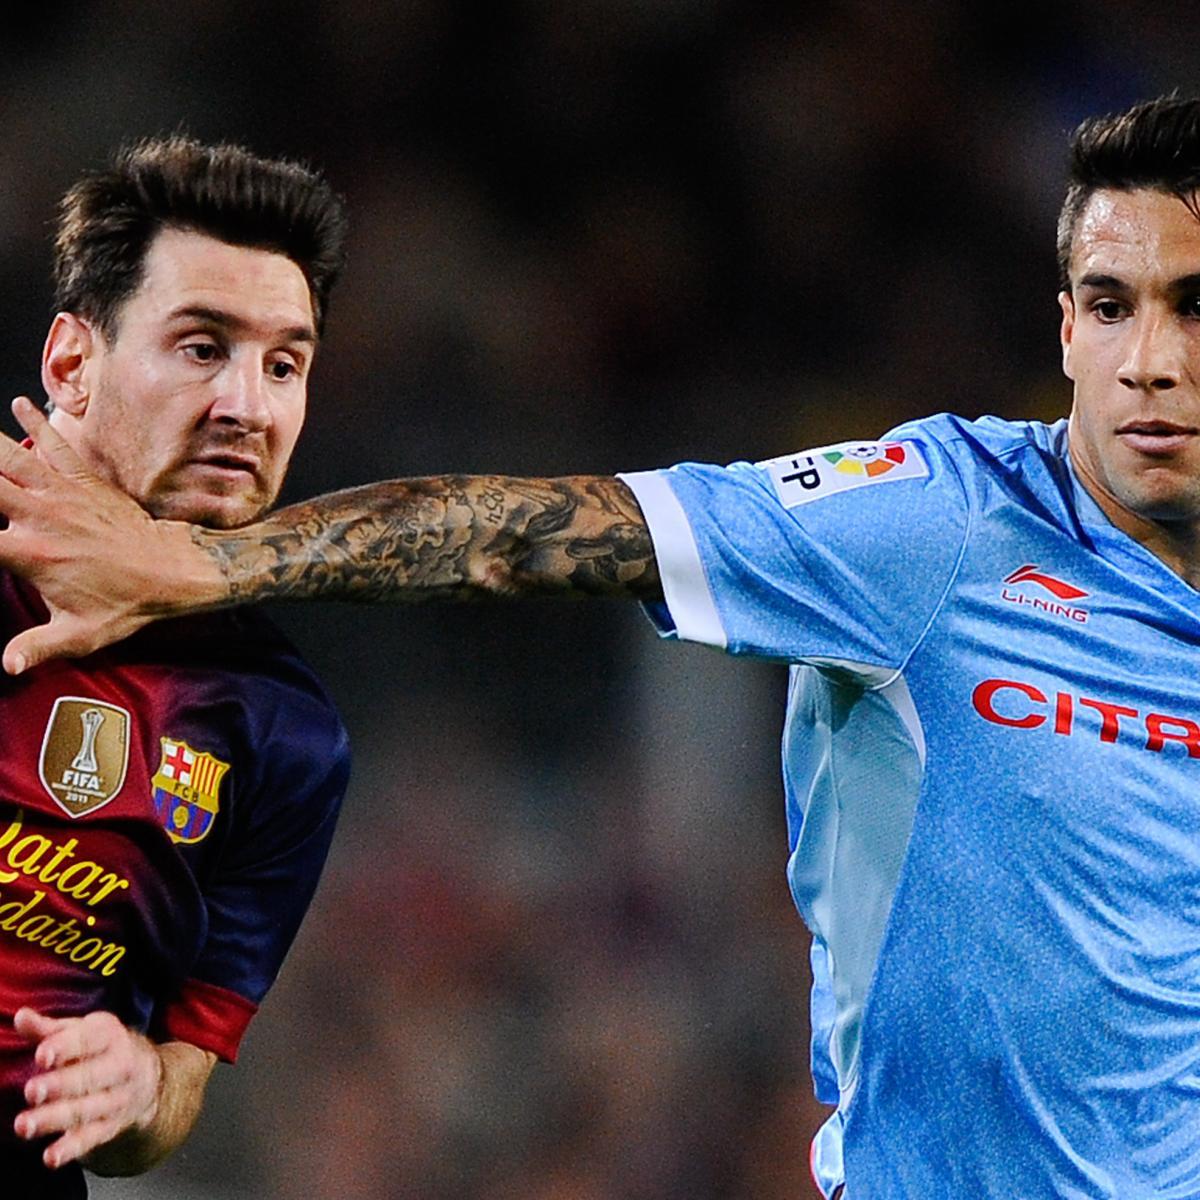 Celta Vigo Vs. FC Barcelona: Rating The Teams And